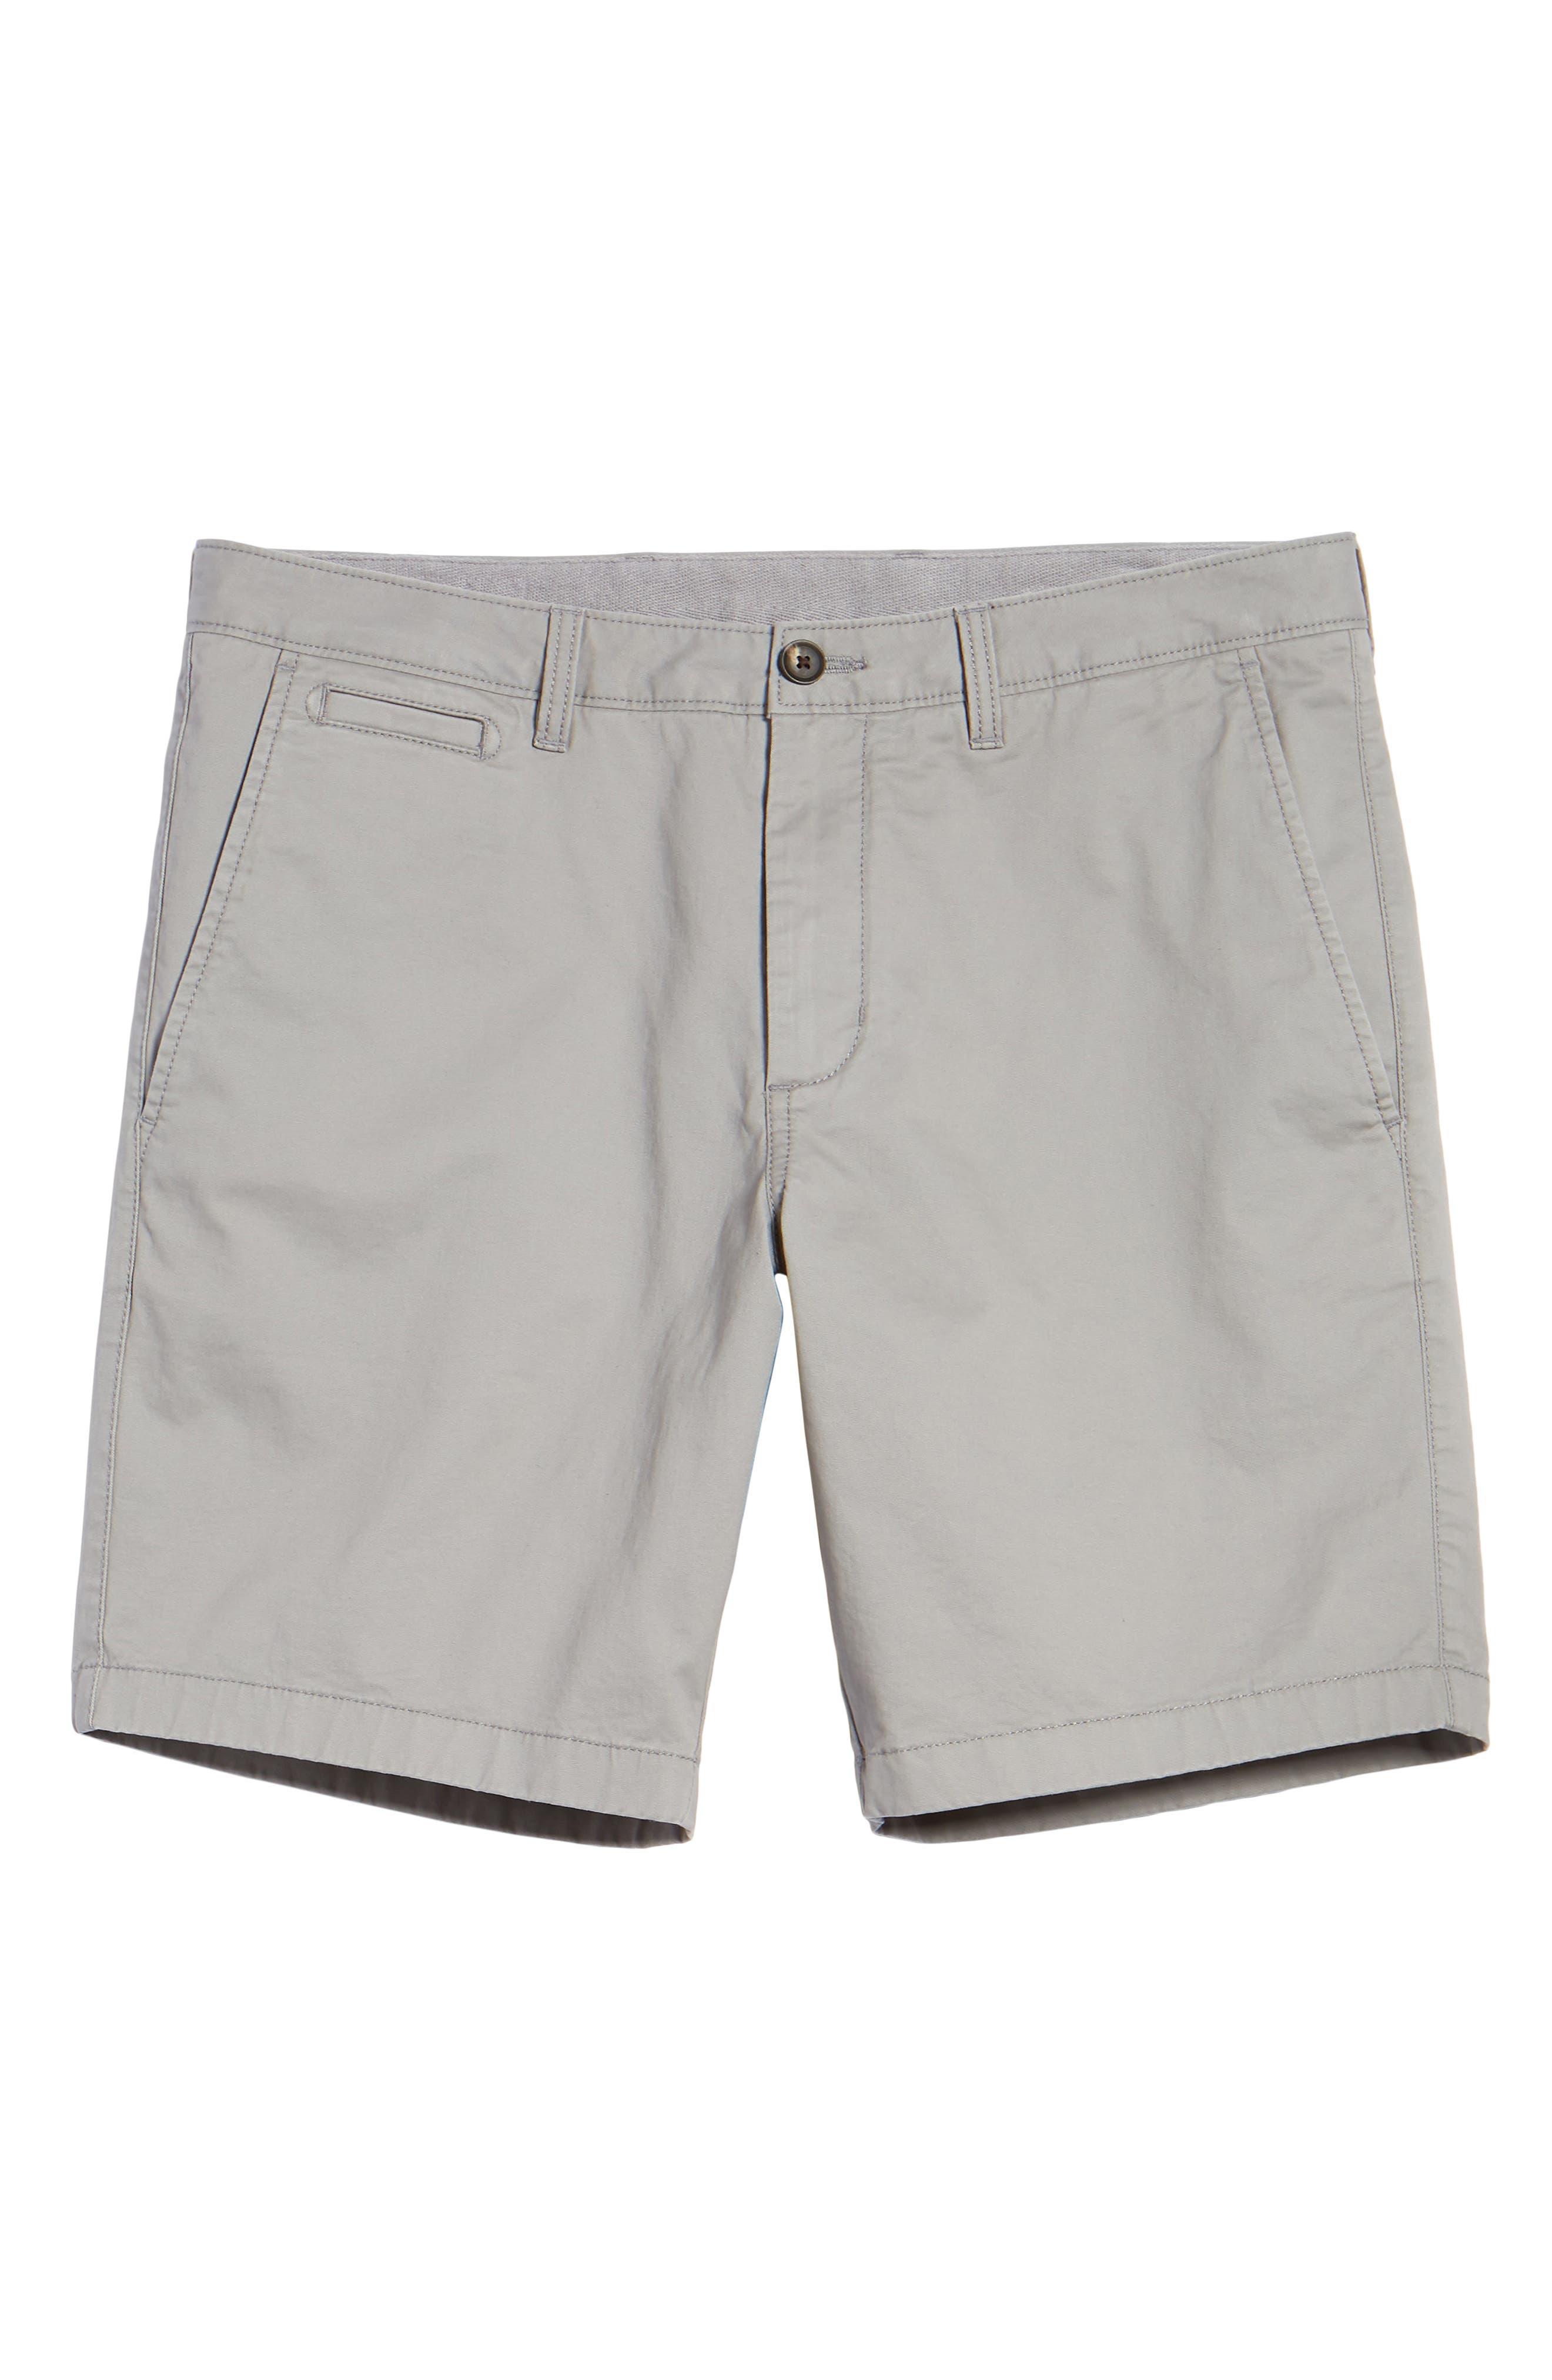 Ballard Slim Fit Stretch Chino 9-Inch Shorts,                             Alternate thumbnail 6, color,                             030